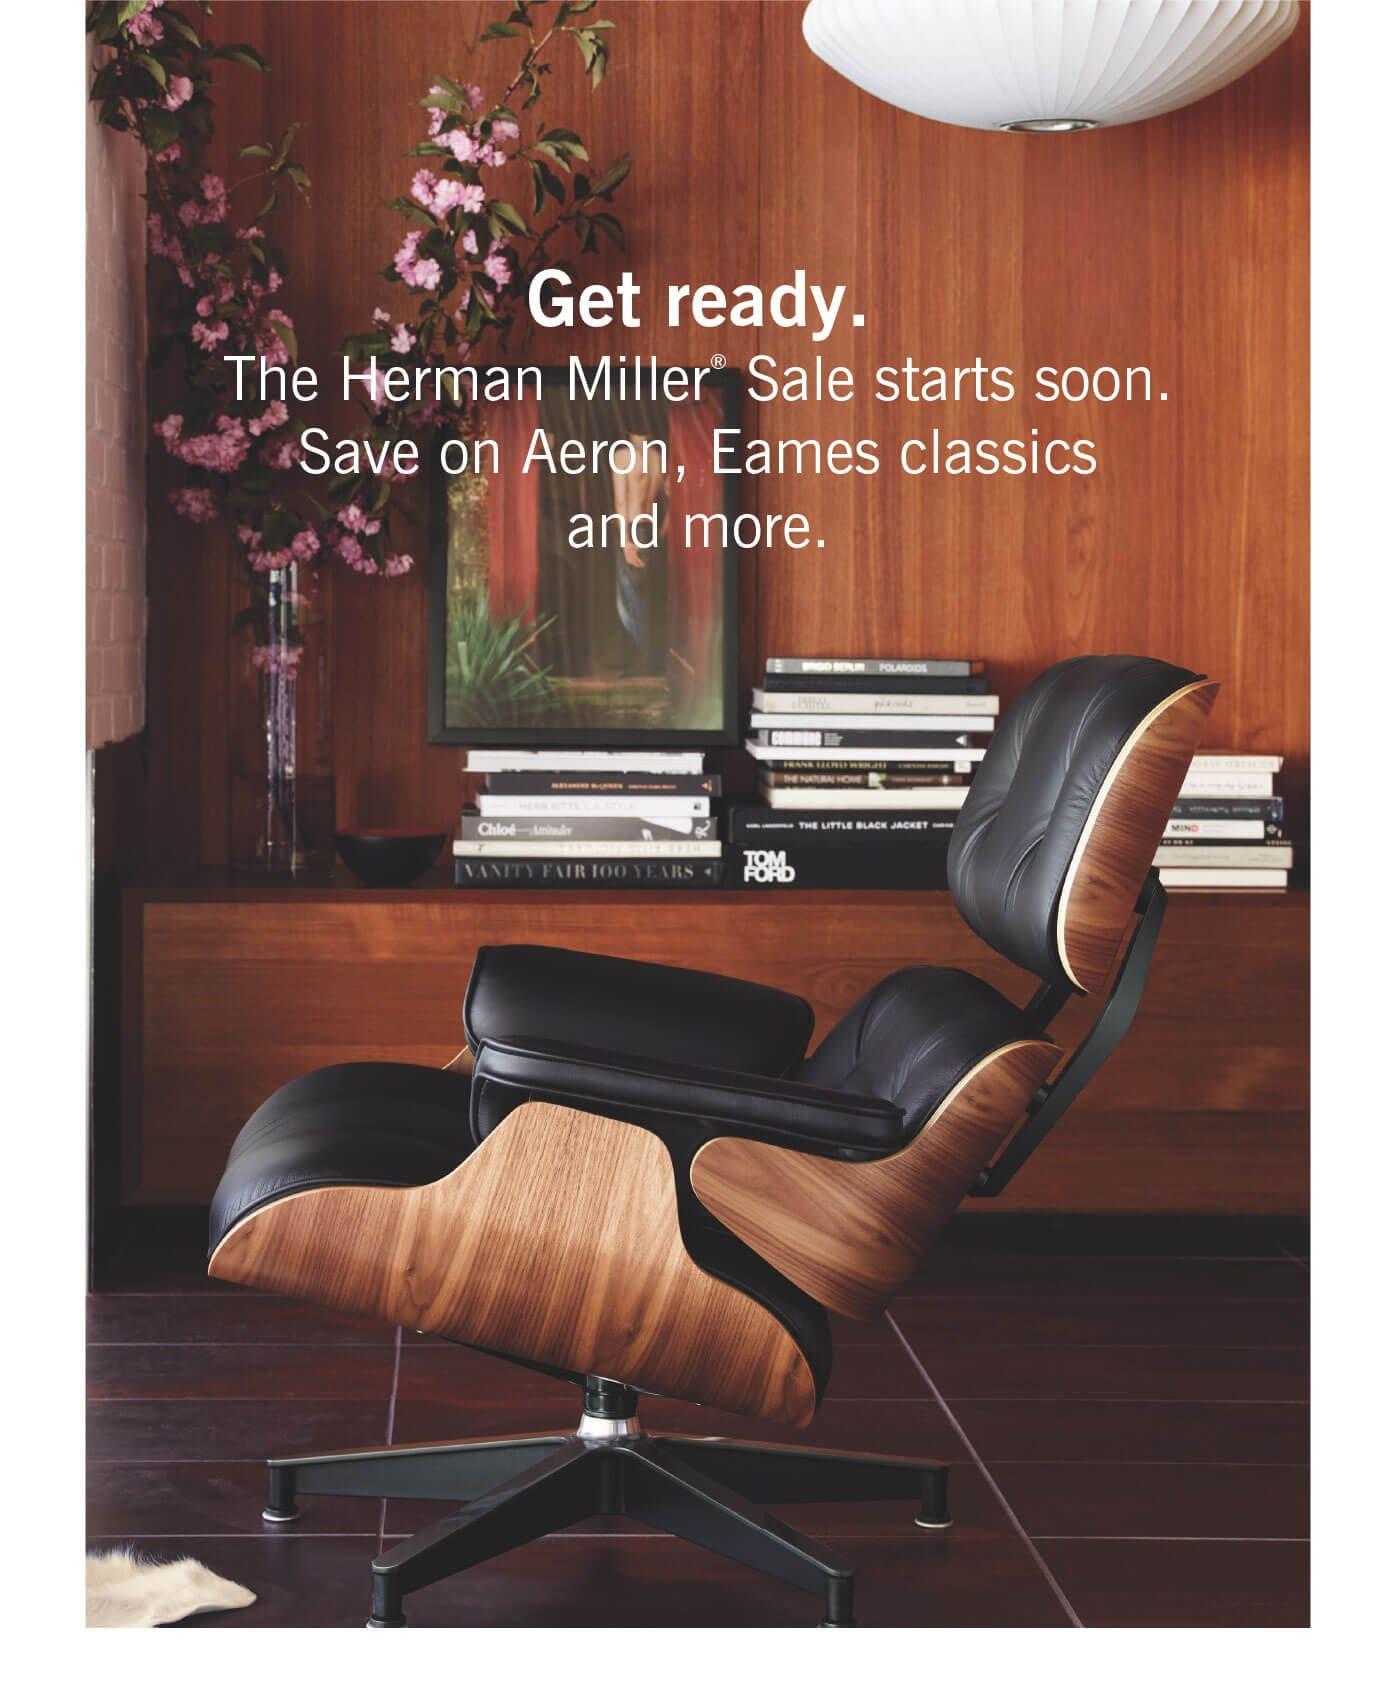 The Herman Miller® Sale starts soon.